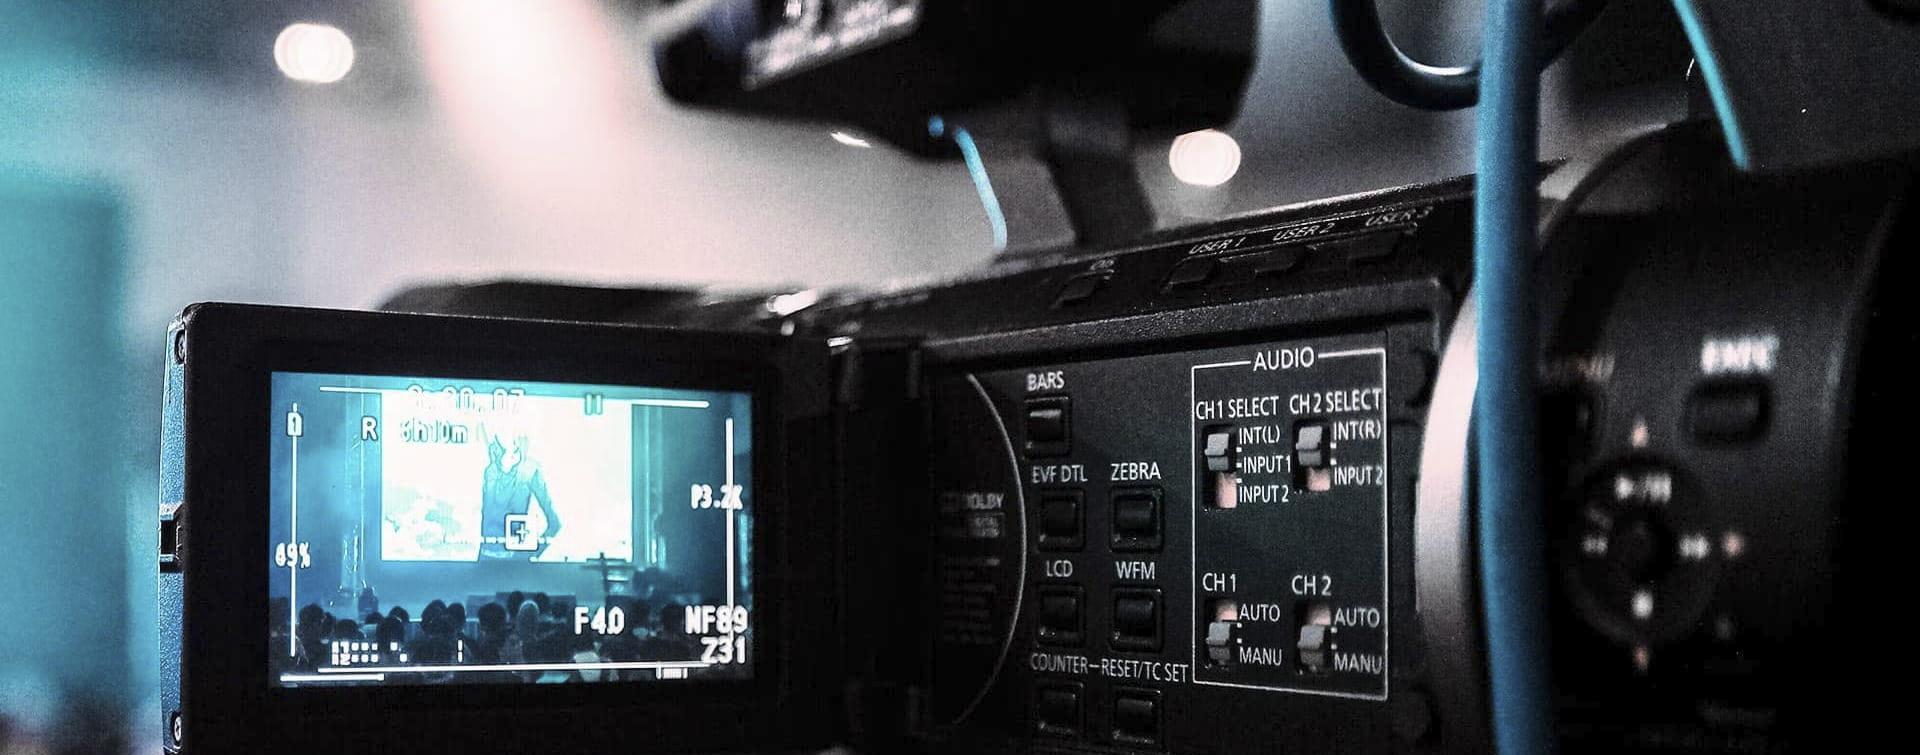 videoclip video musicali vercelli novara vigevano